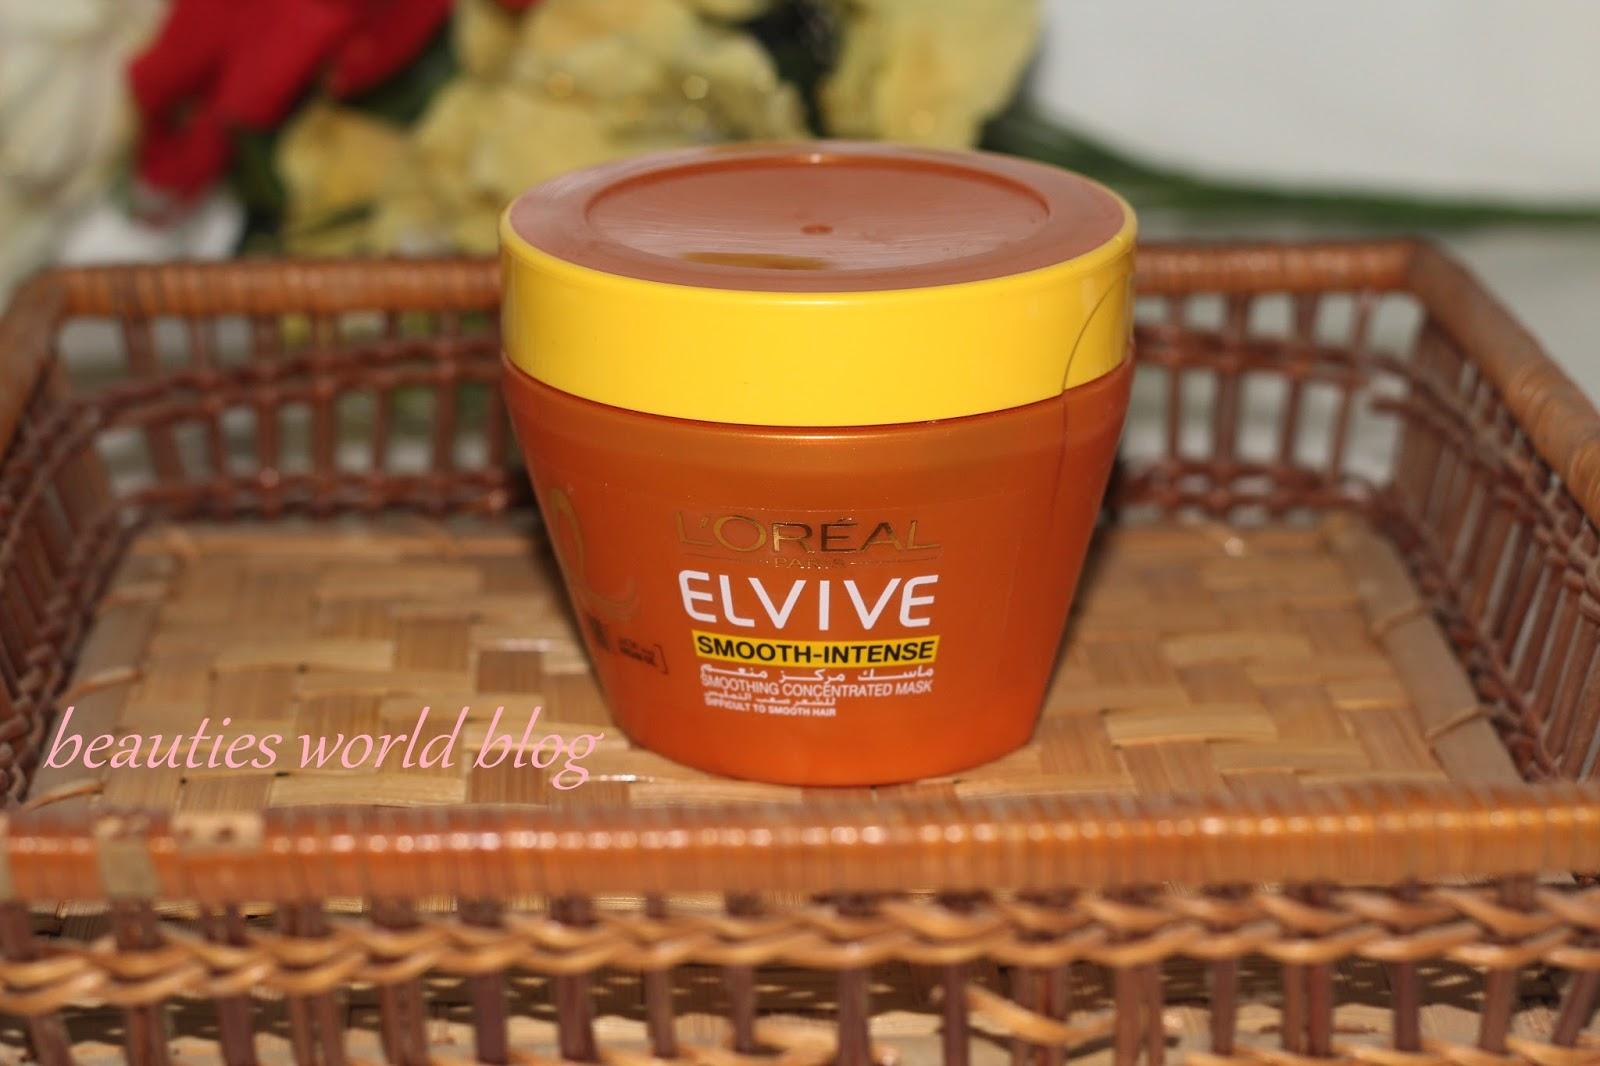 12ca8f7d4 l'oreal elvive smooth intense hair mask with organ oil - heba blog